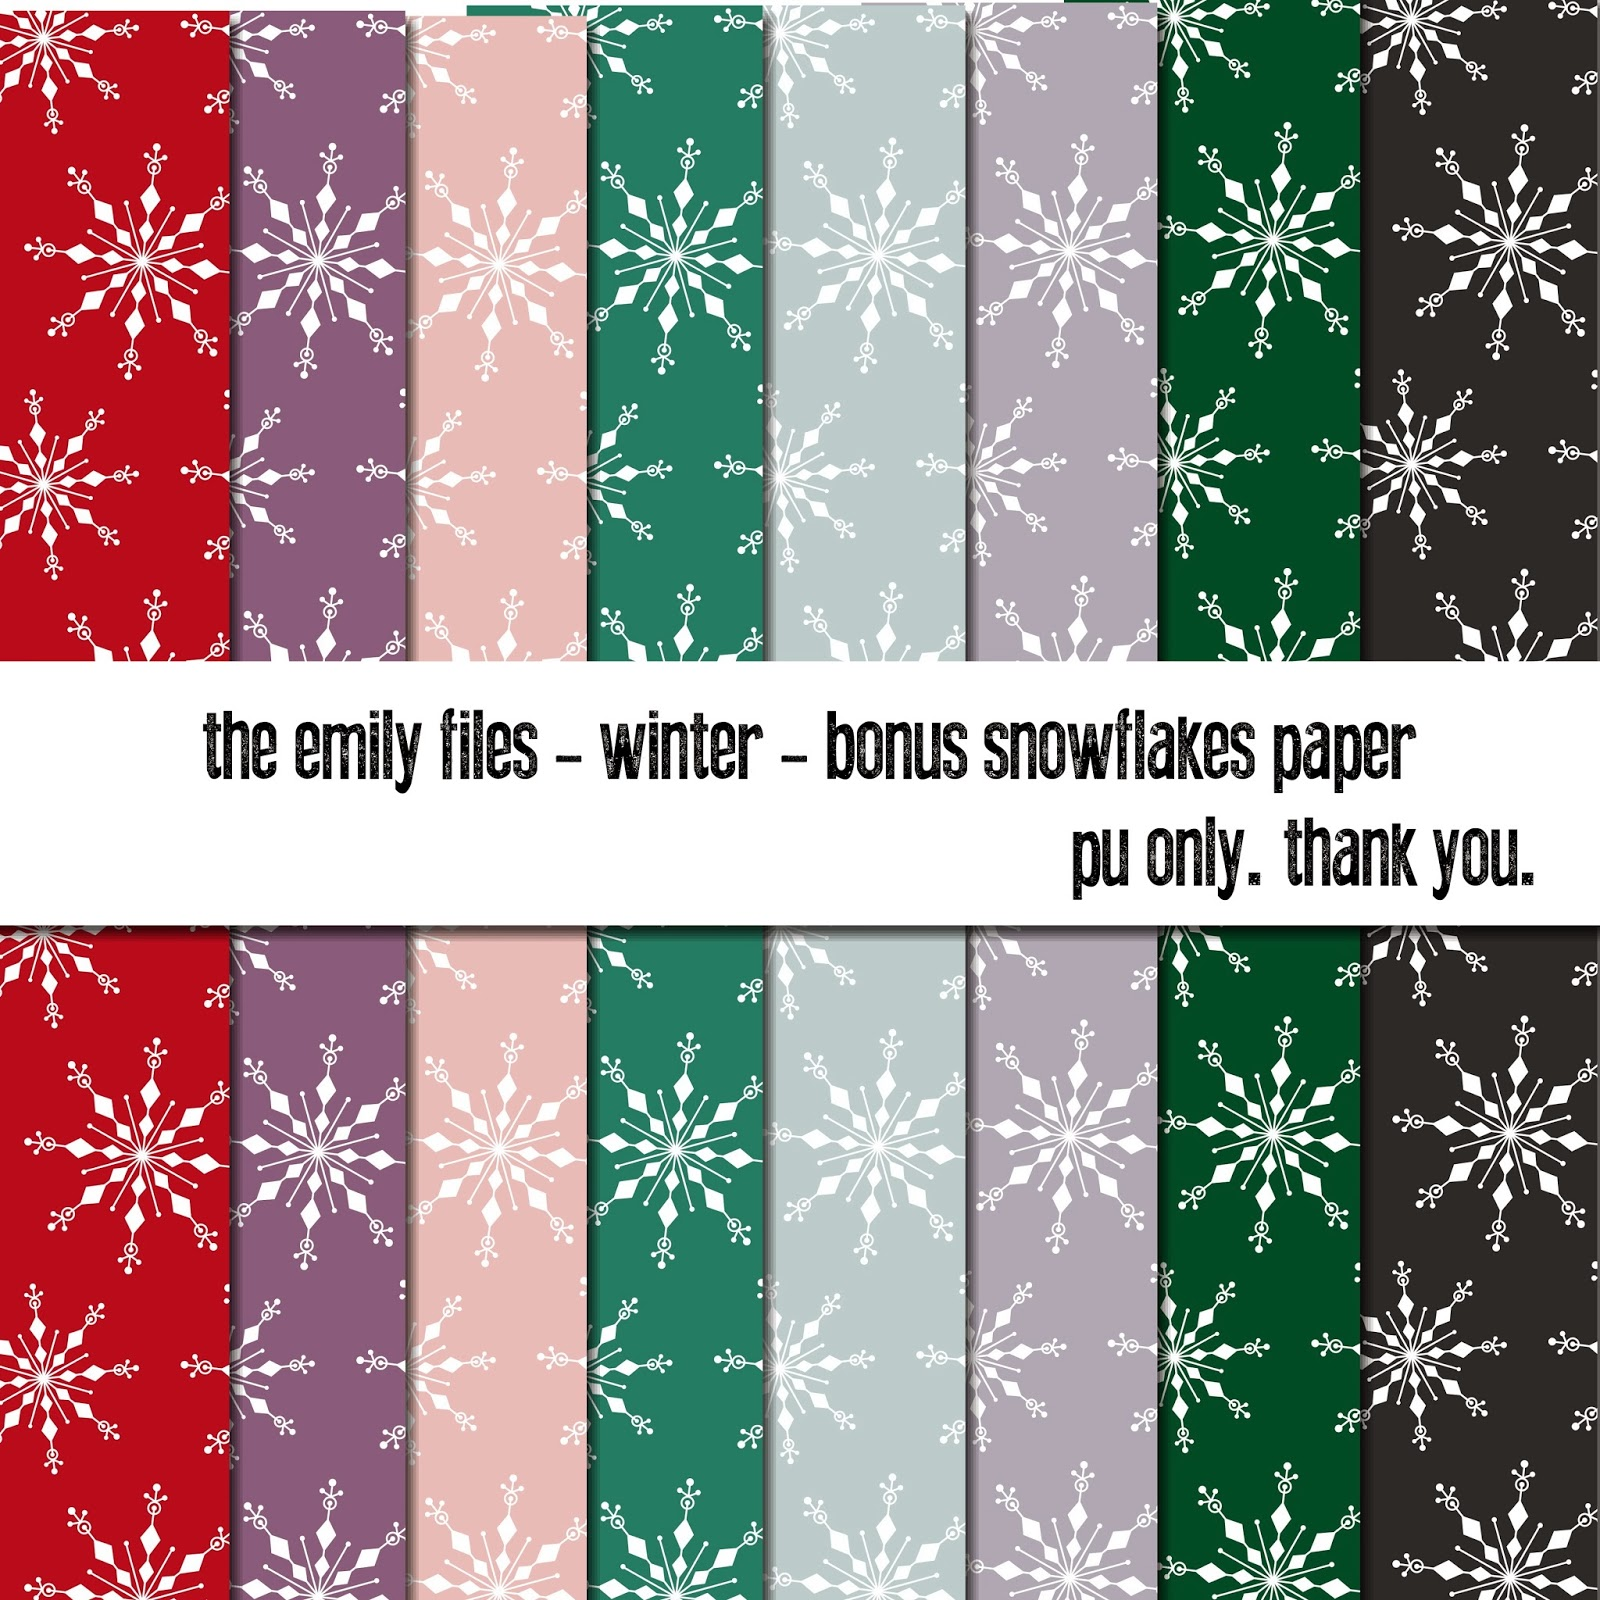 Extra Special Double Bonus Free Snowflake Paper